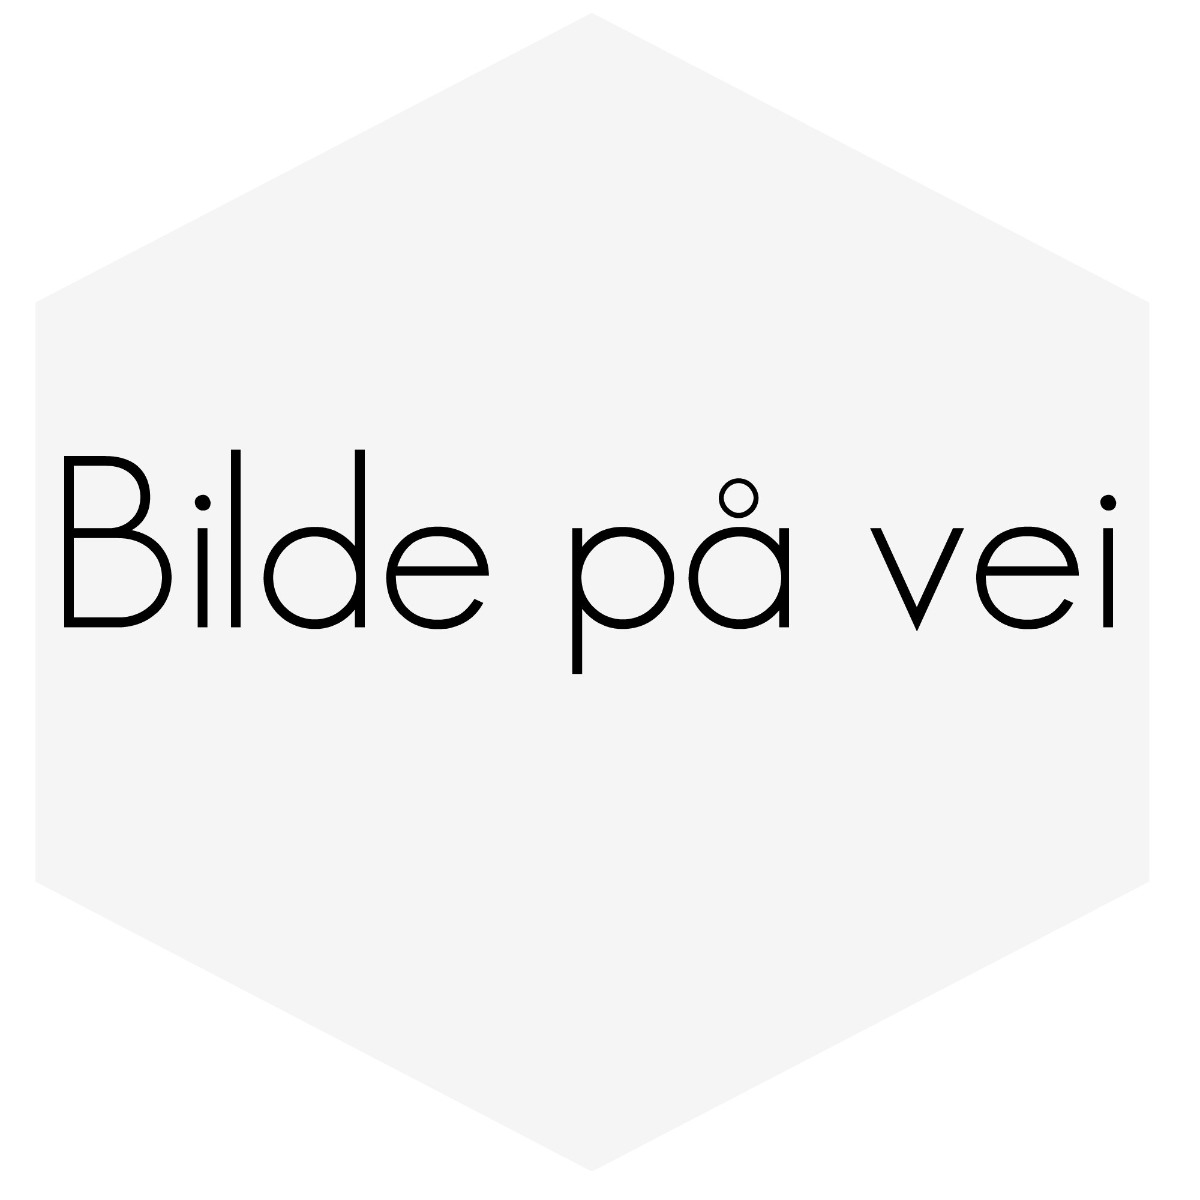 FLENS GRENRØR VOLVO 8V STÅL 10MM